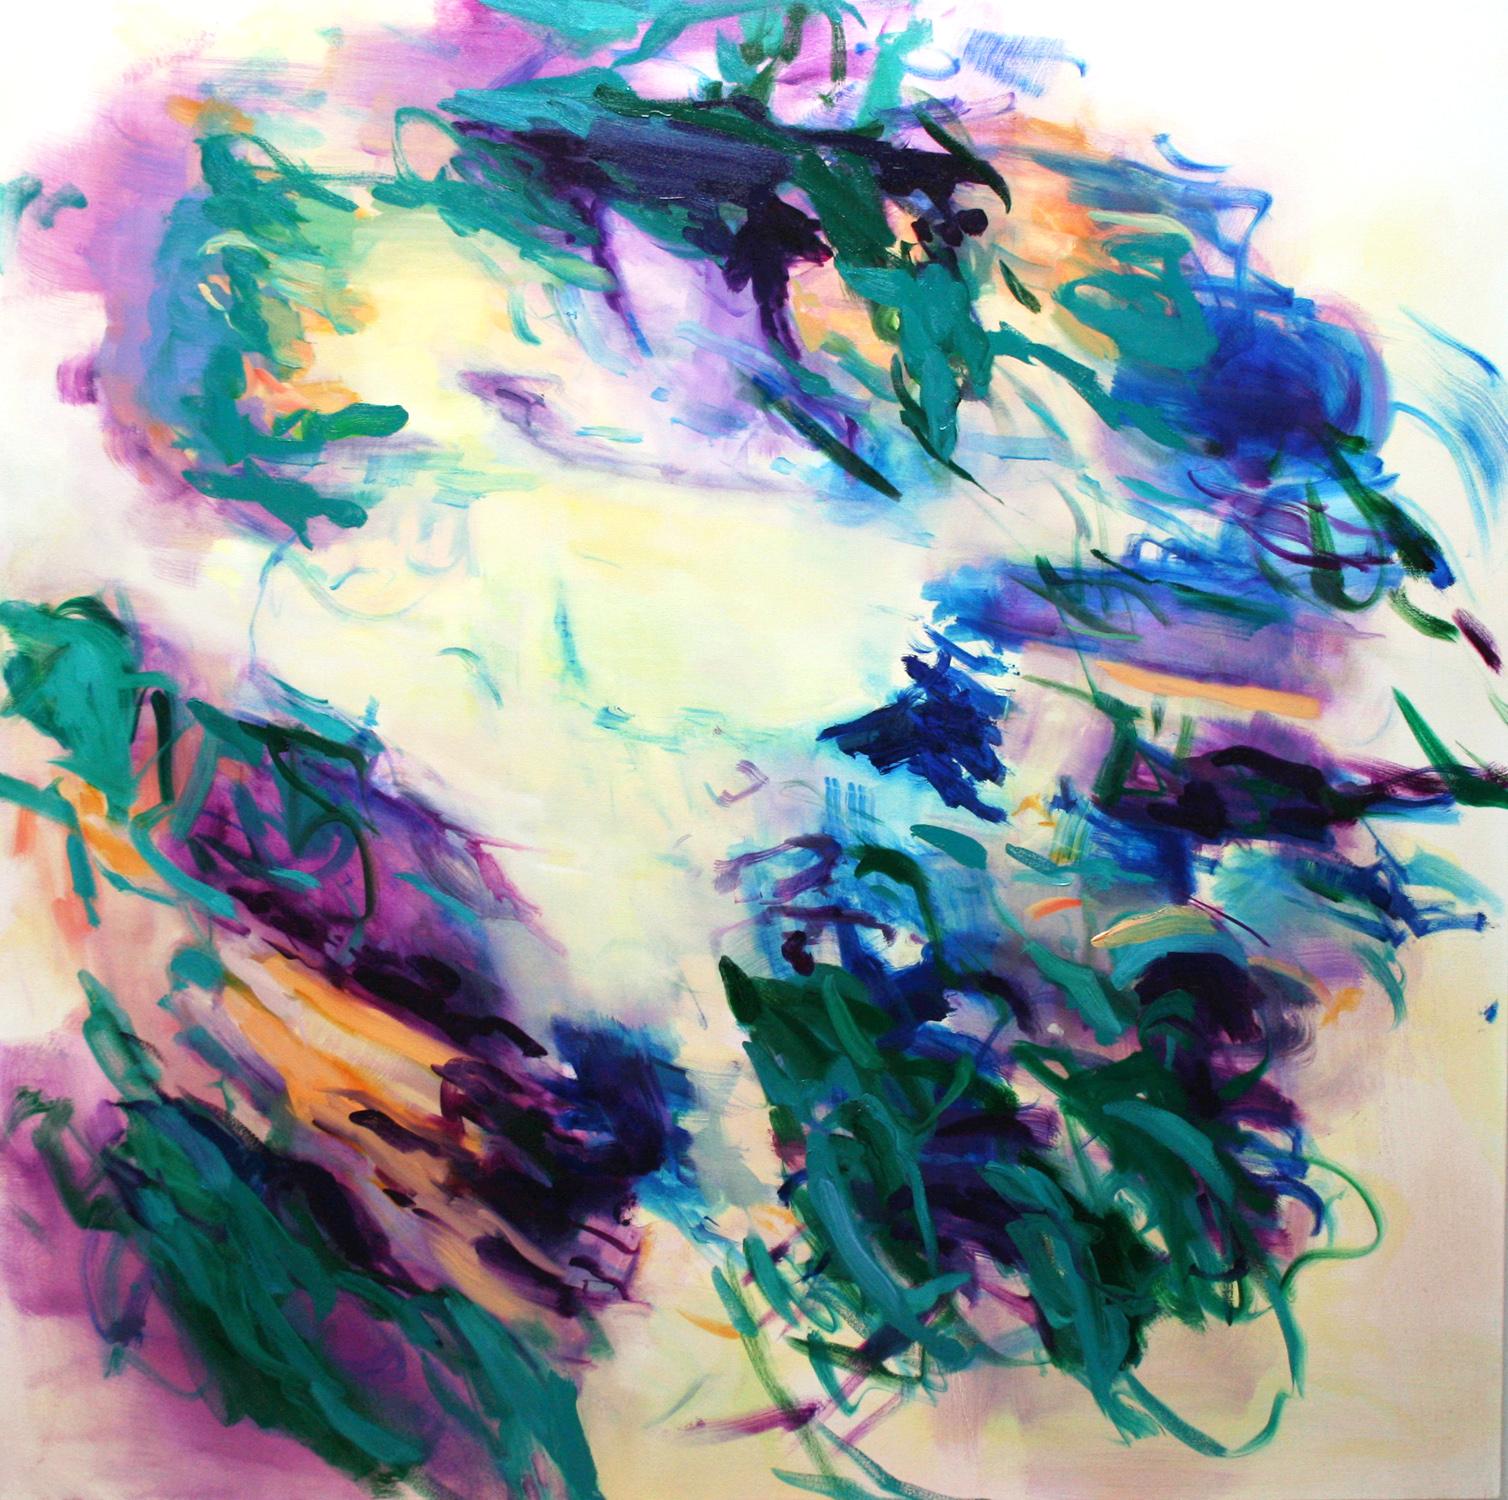 Untitled  (lemon  turquoise)  2017  oil on canvas  145 x 145 cm